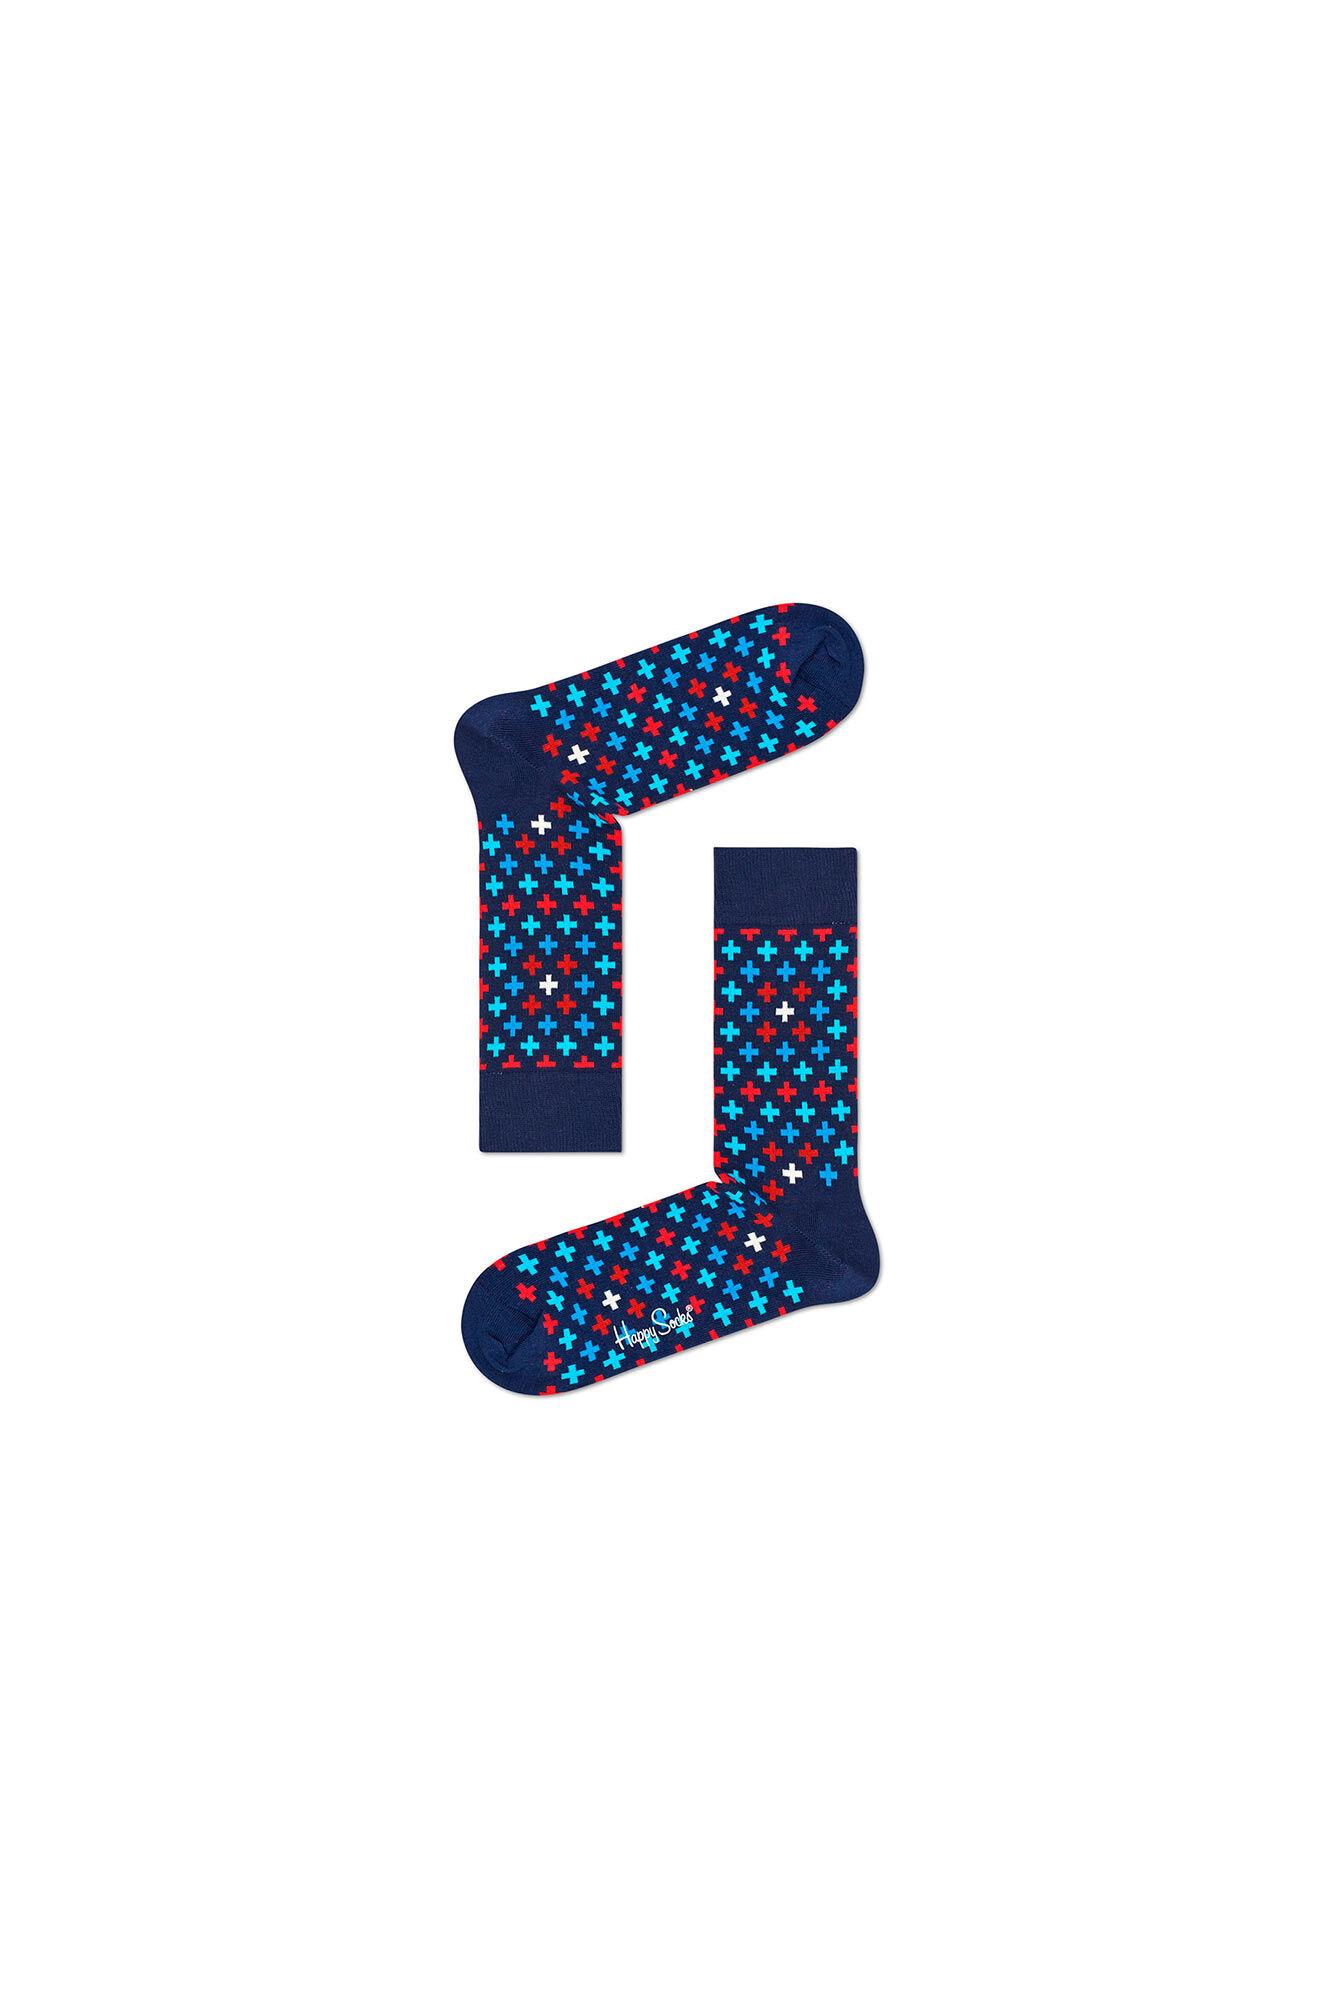 Plus Sock PLU01